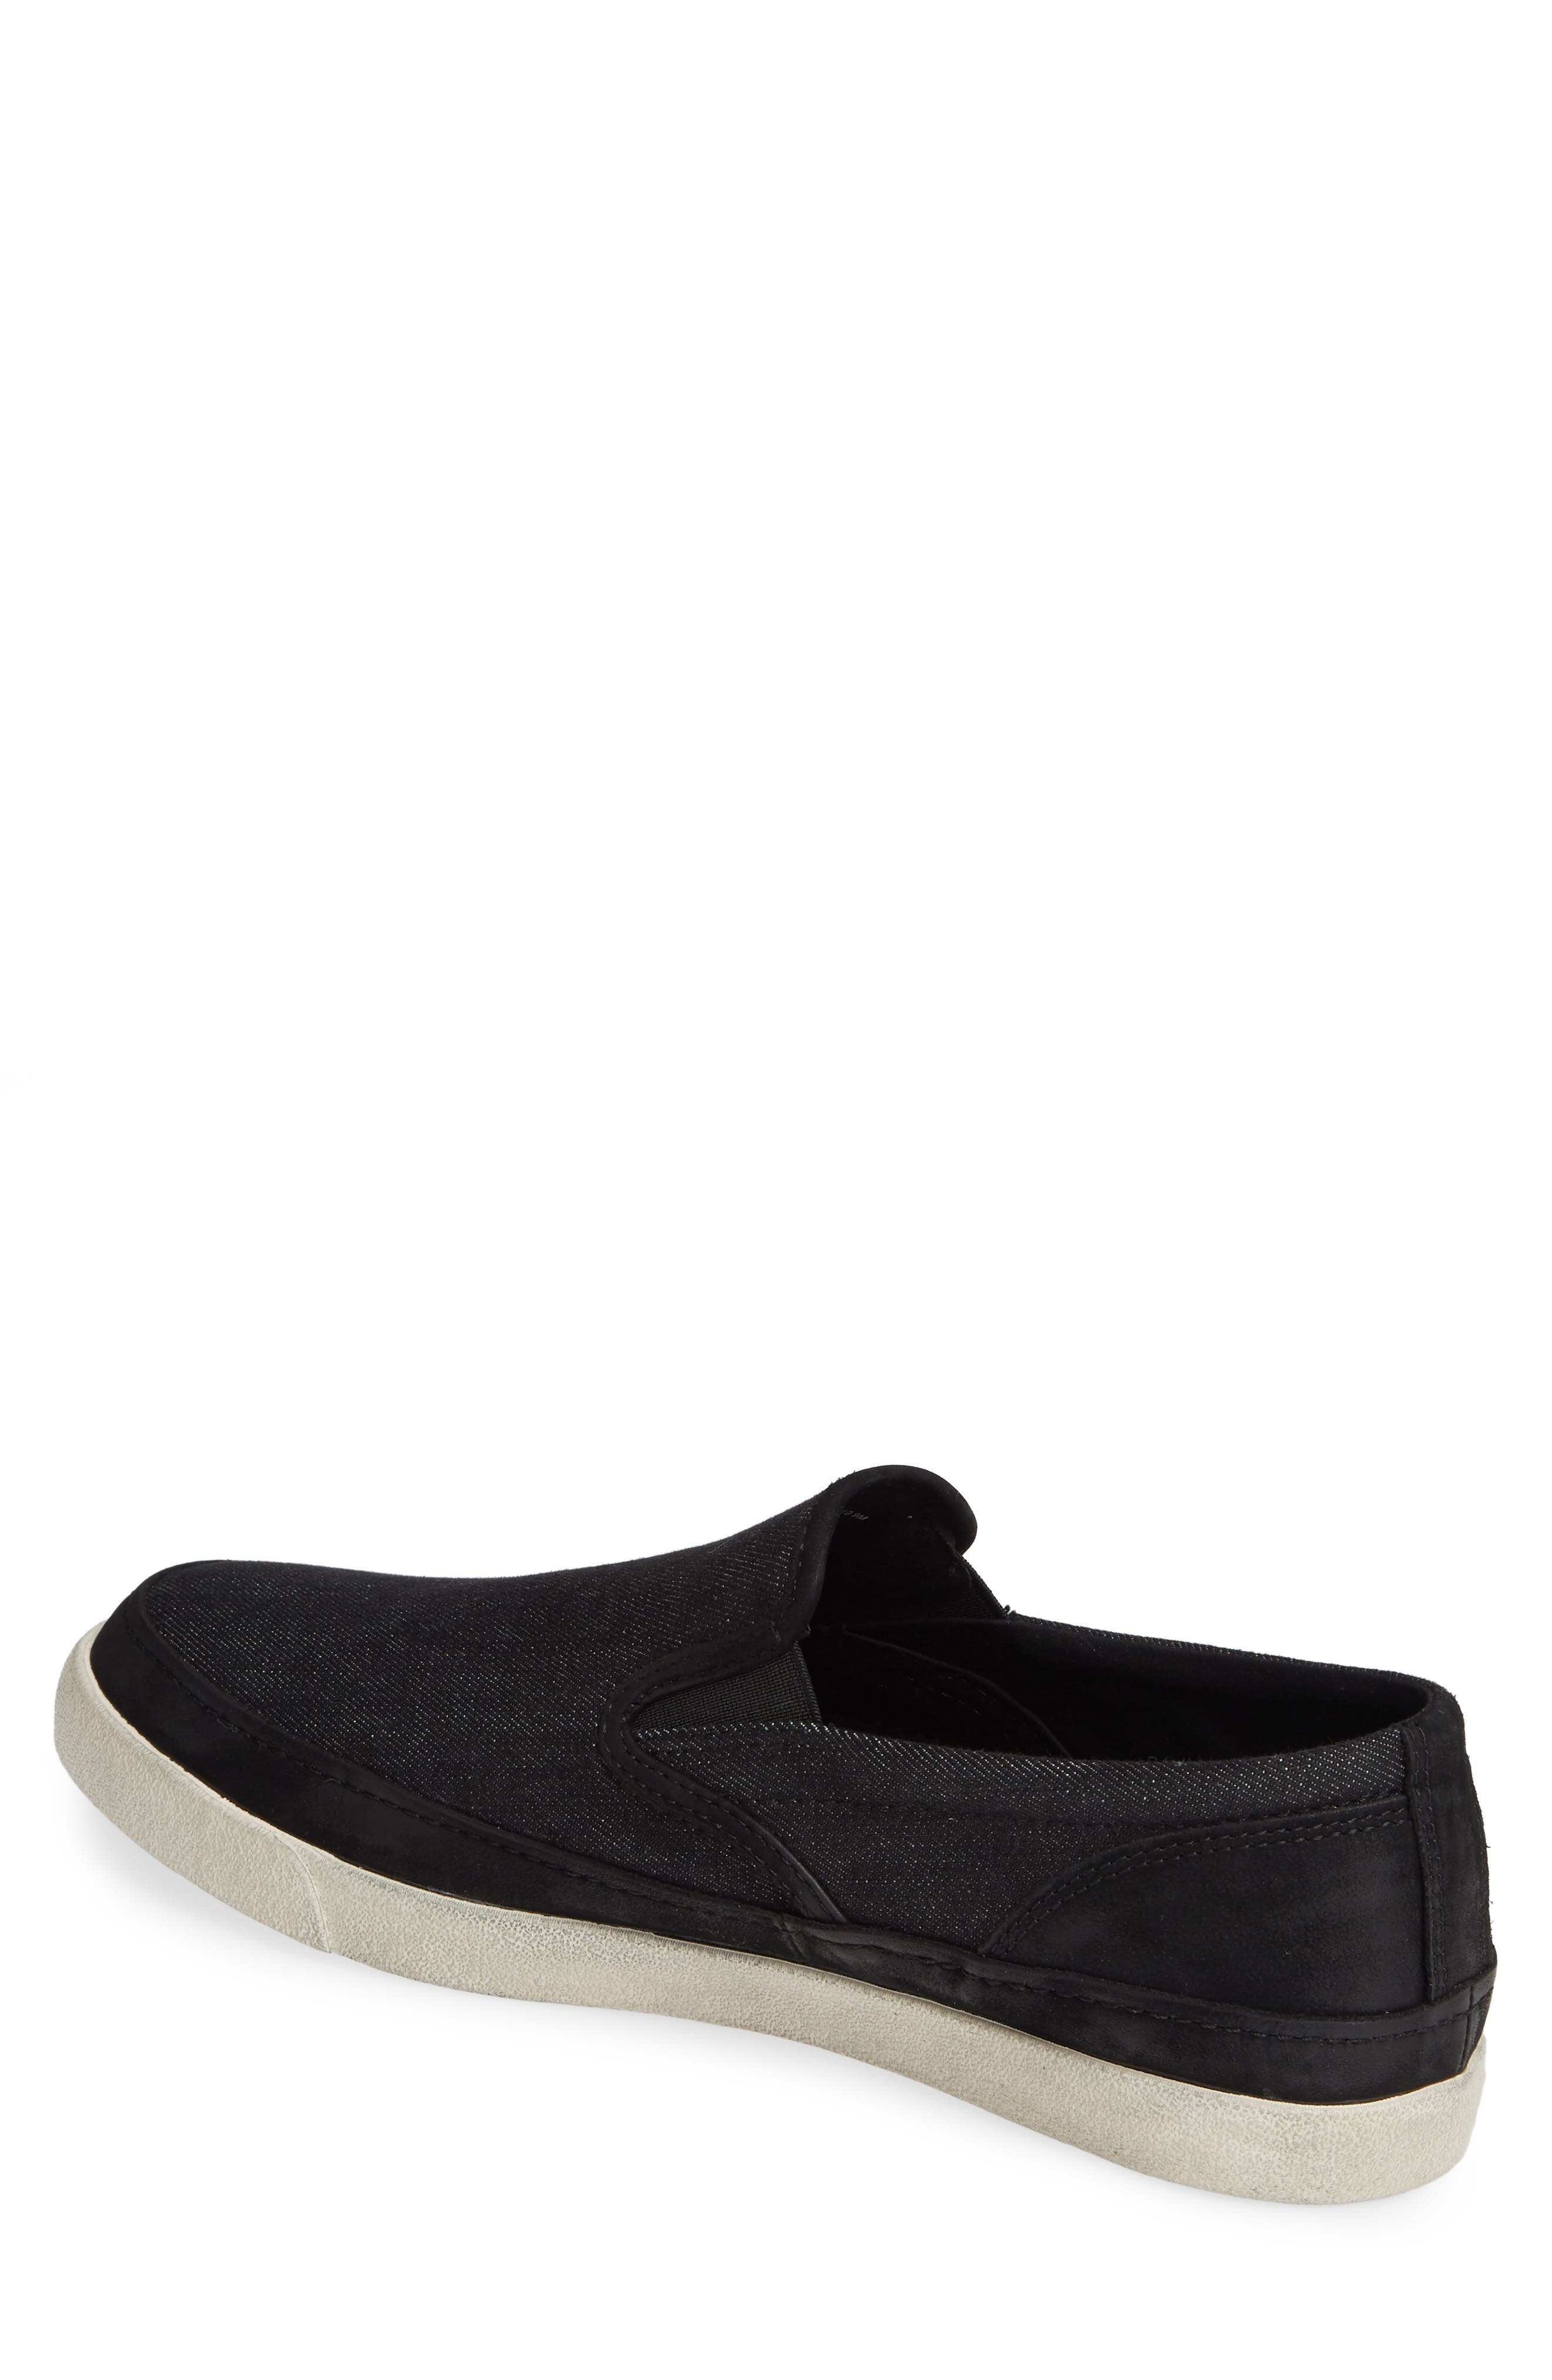 JOHN VARVATOS STAR USA, Jet Canvas Slip-On Sneaker, Alternate thumbnail 2, color, MINERAL BLK